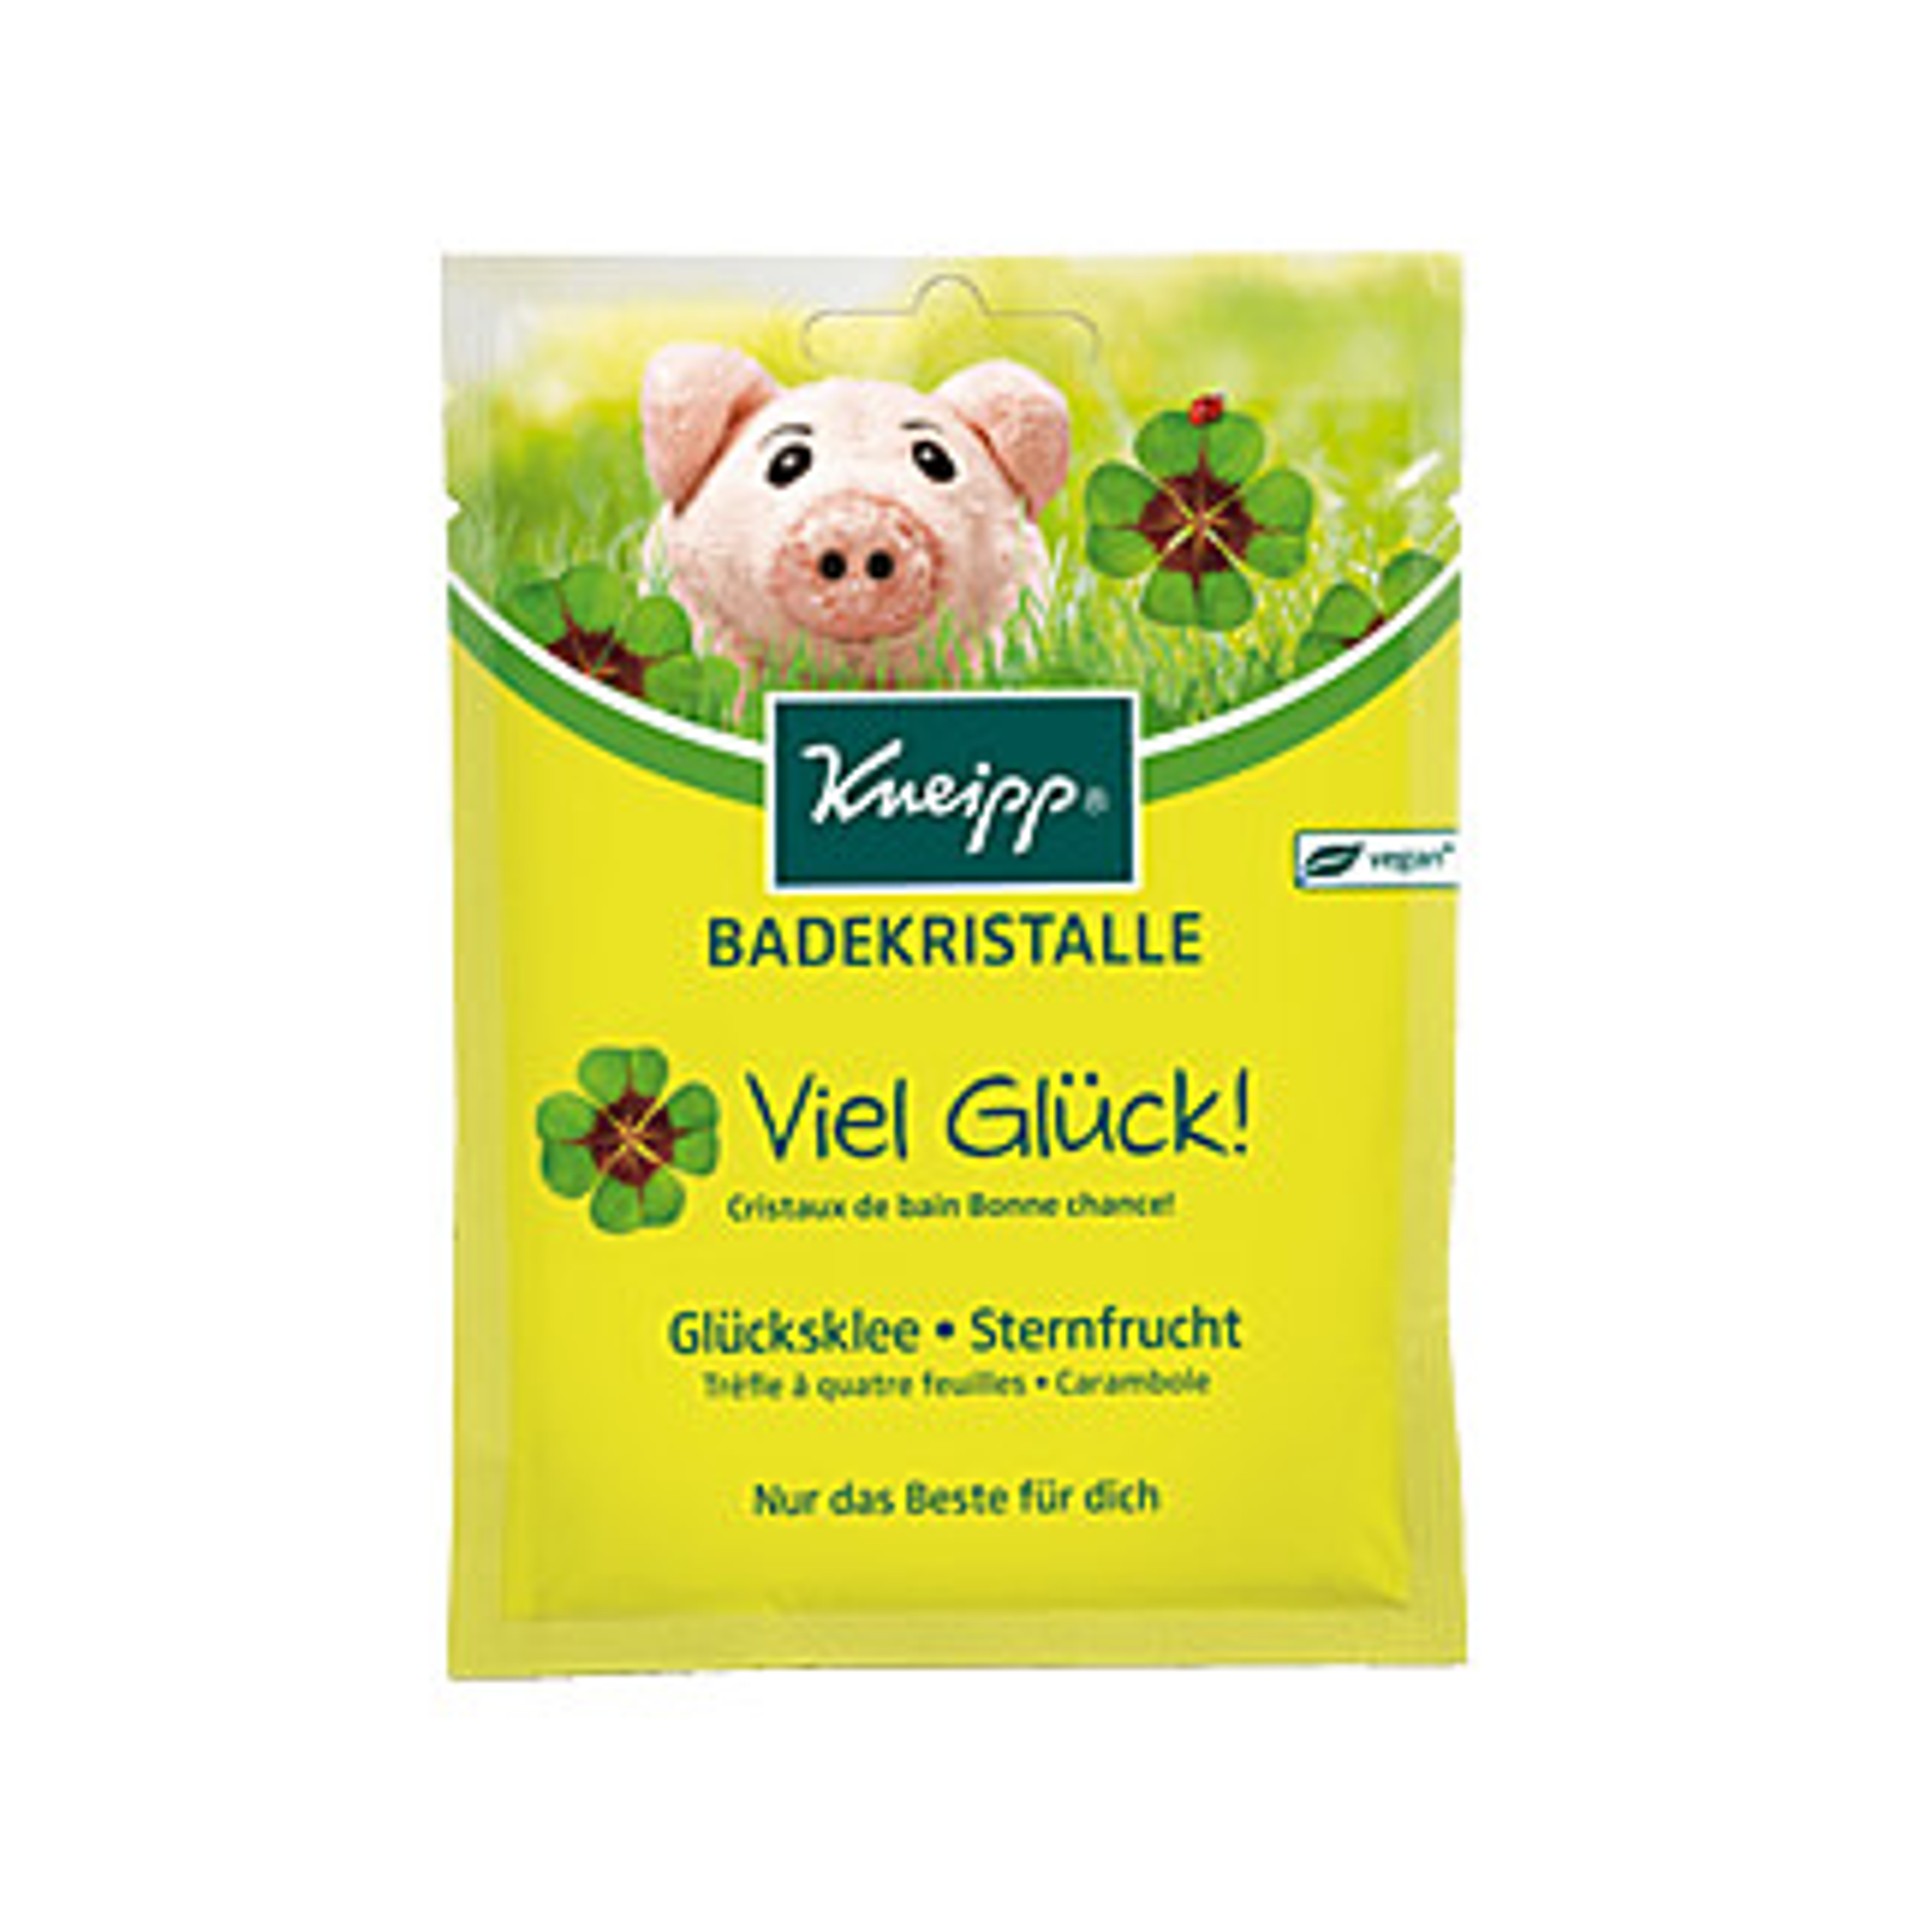 Kneipp Badekristalle Viel Glück!